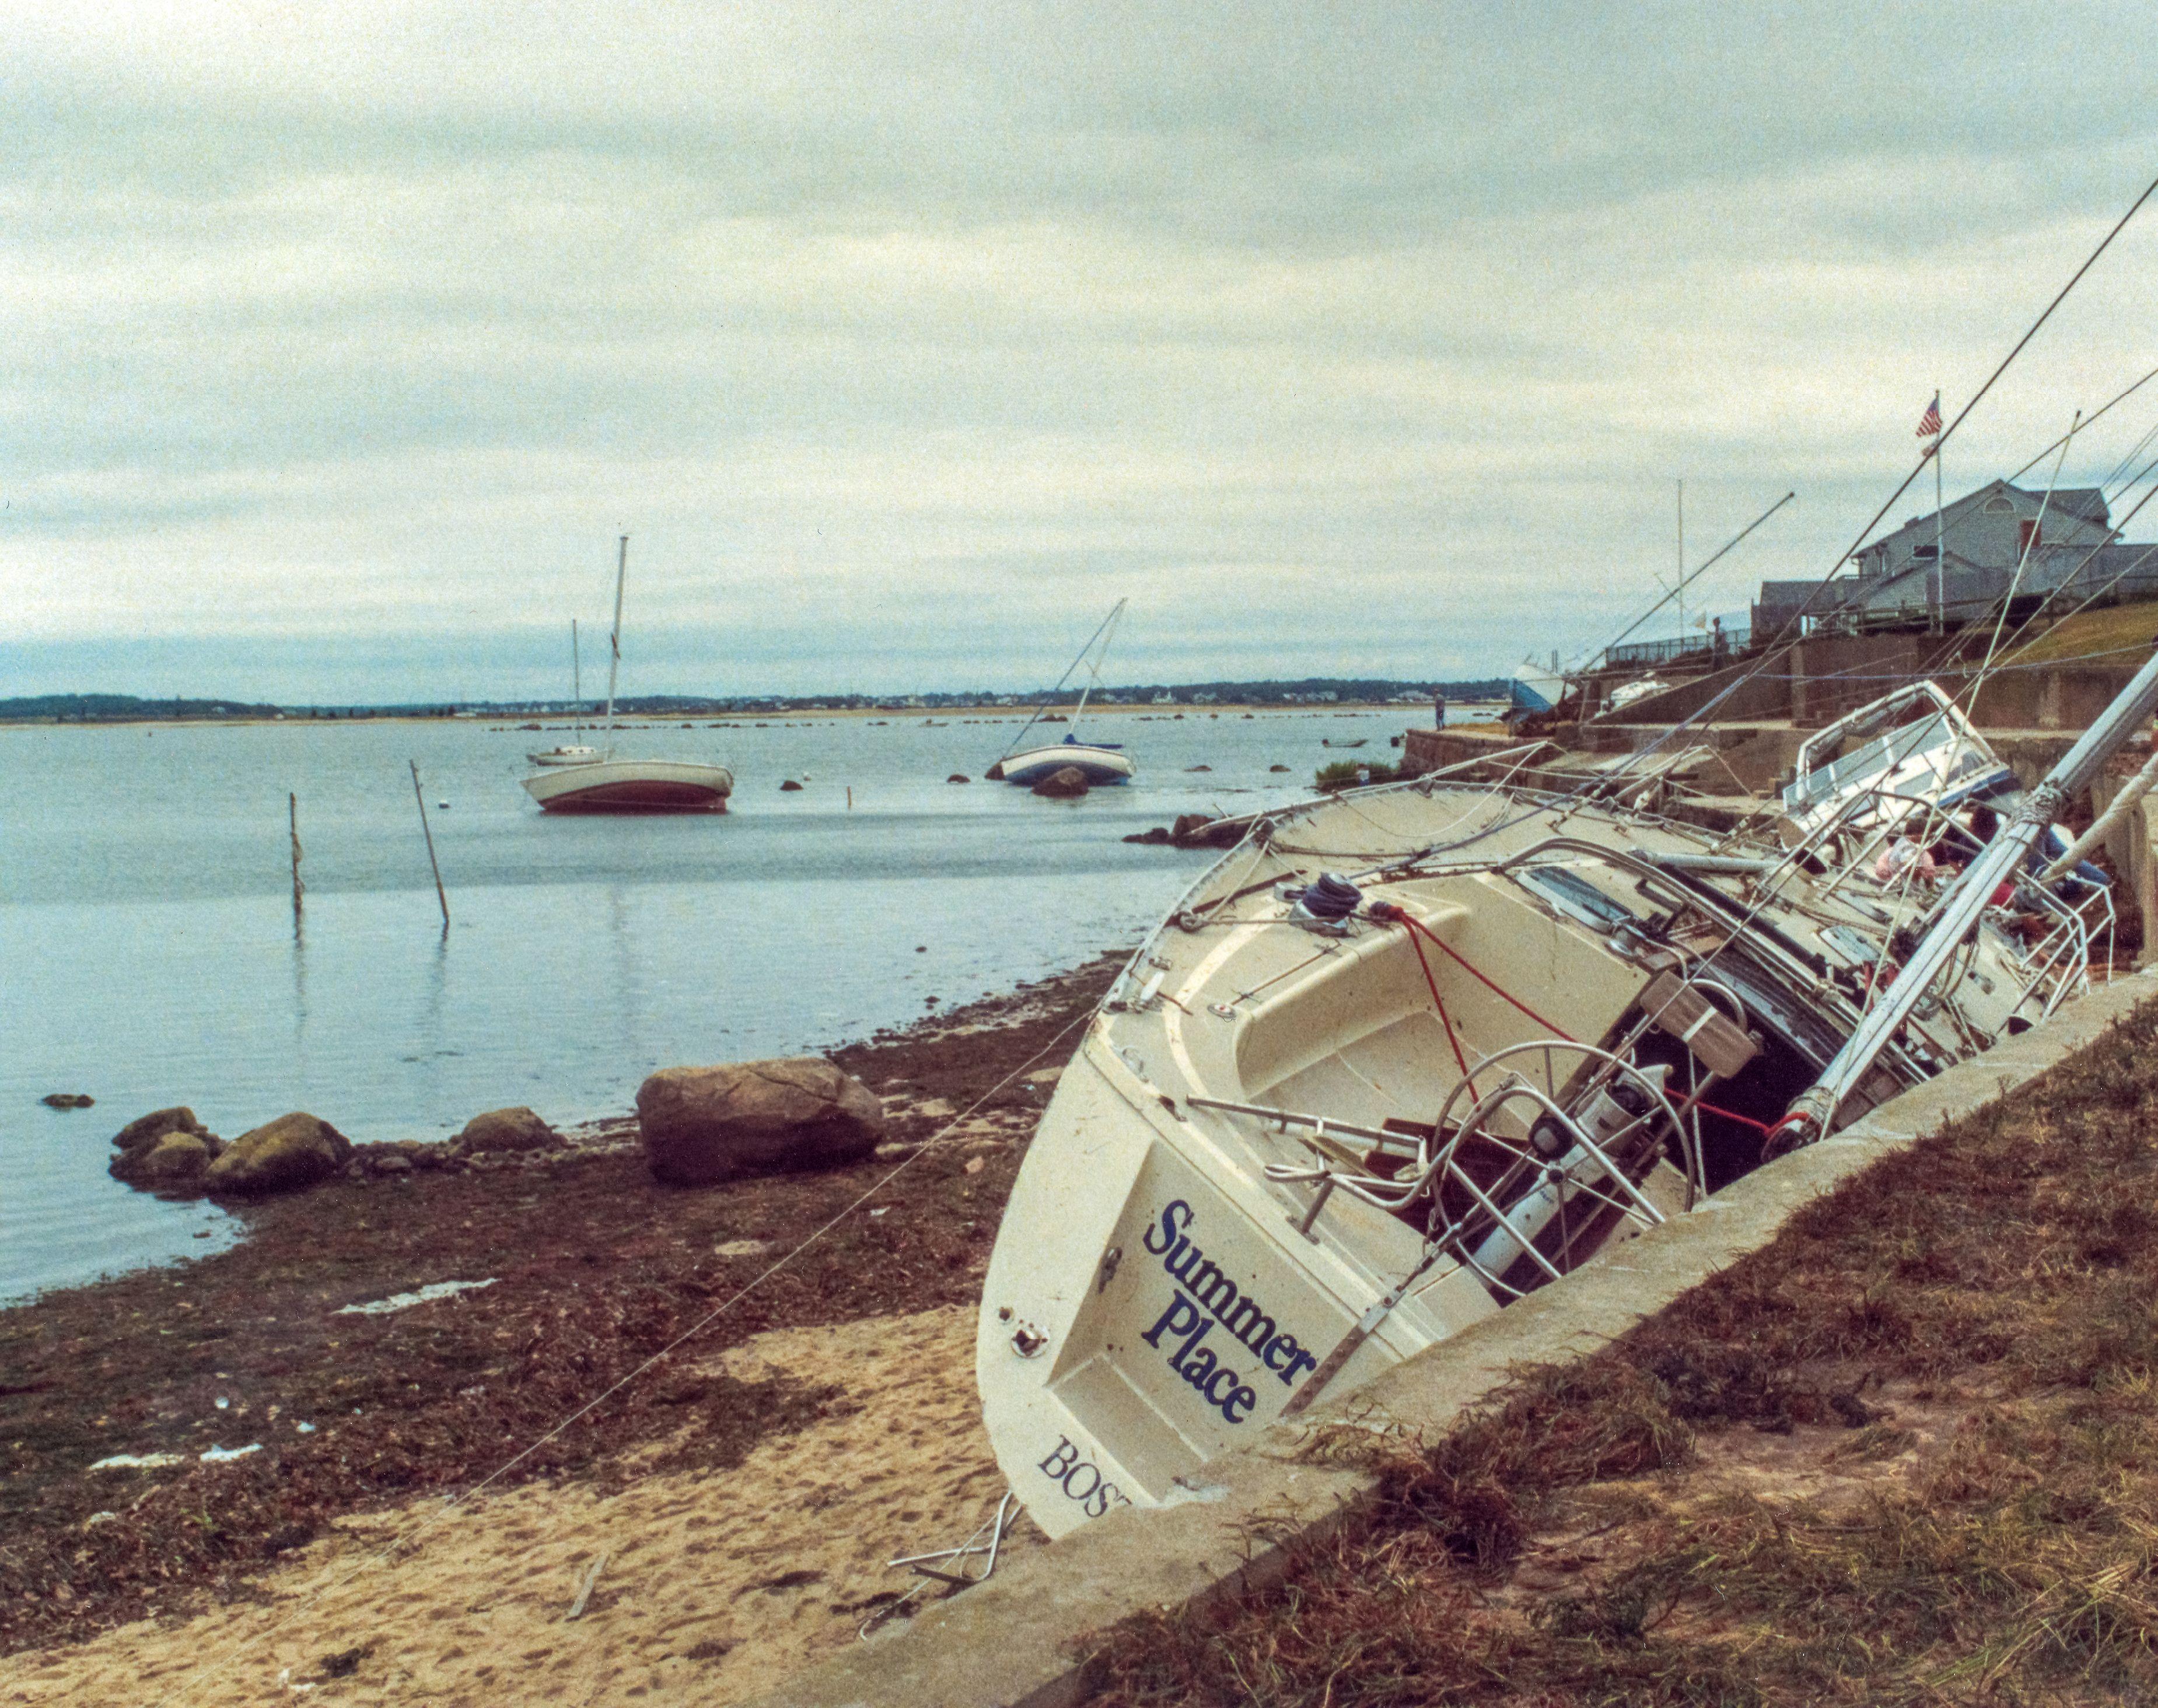 Hurricane Bob Aftermath Monument Beach Cape Cod Massachusetts Monument Cape Cod